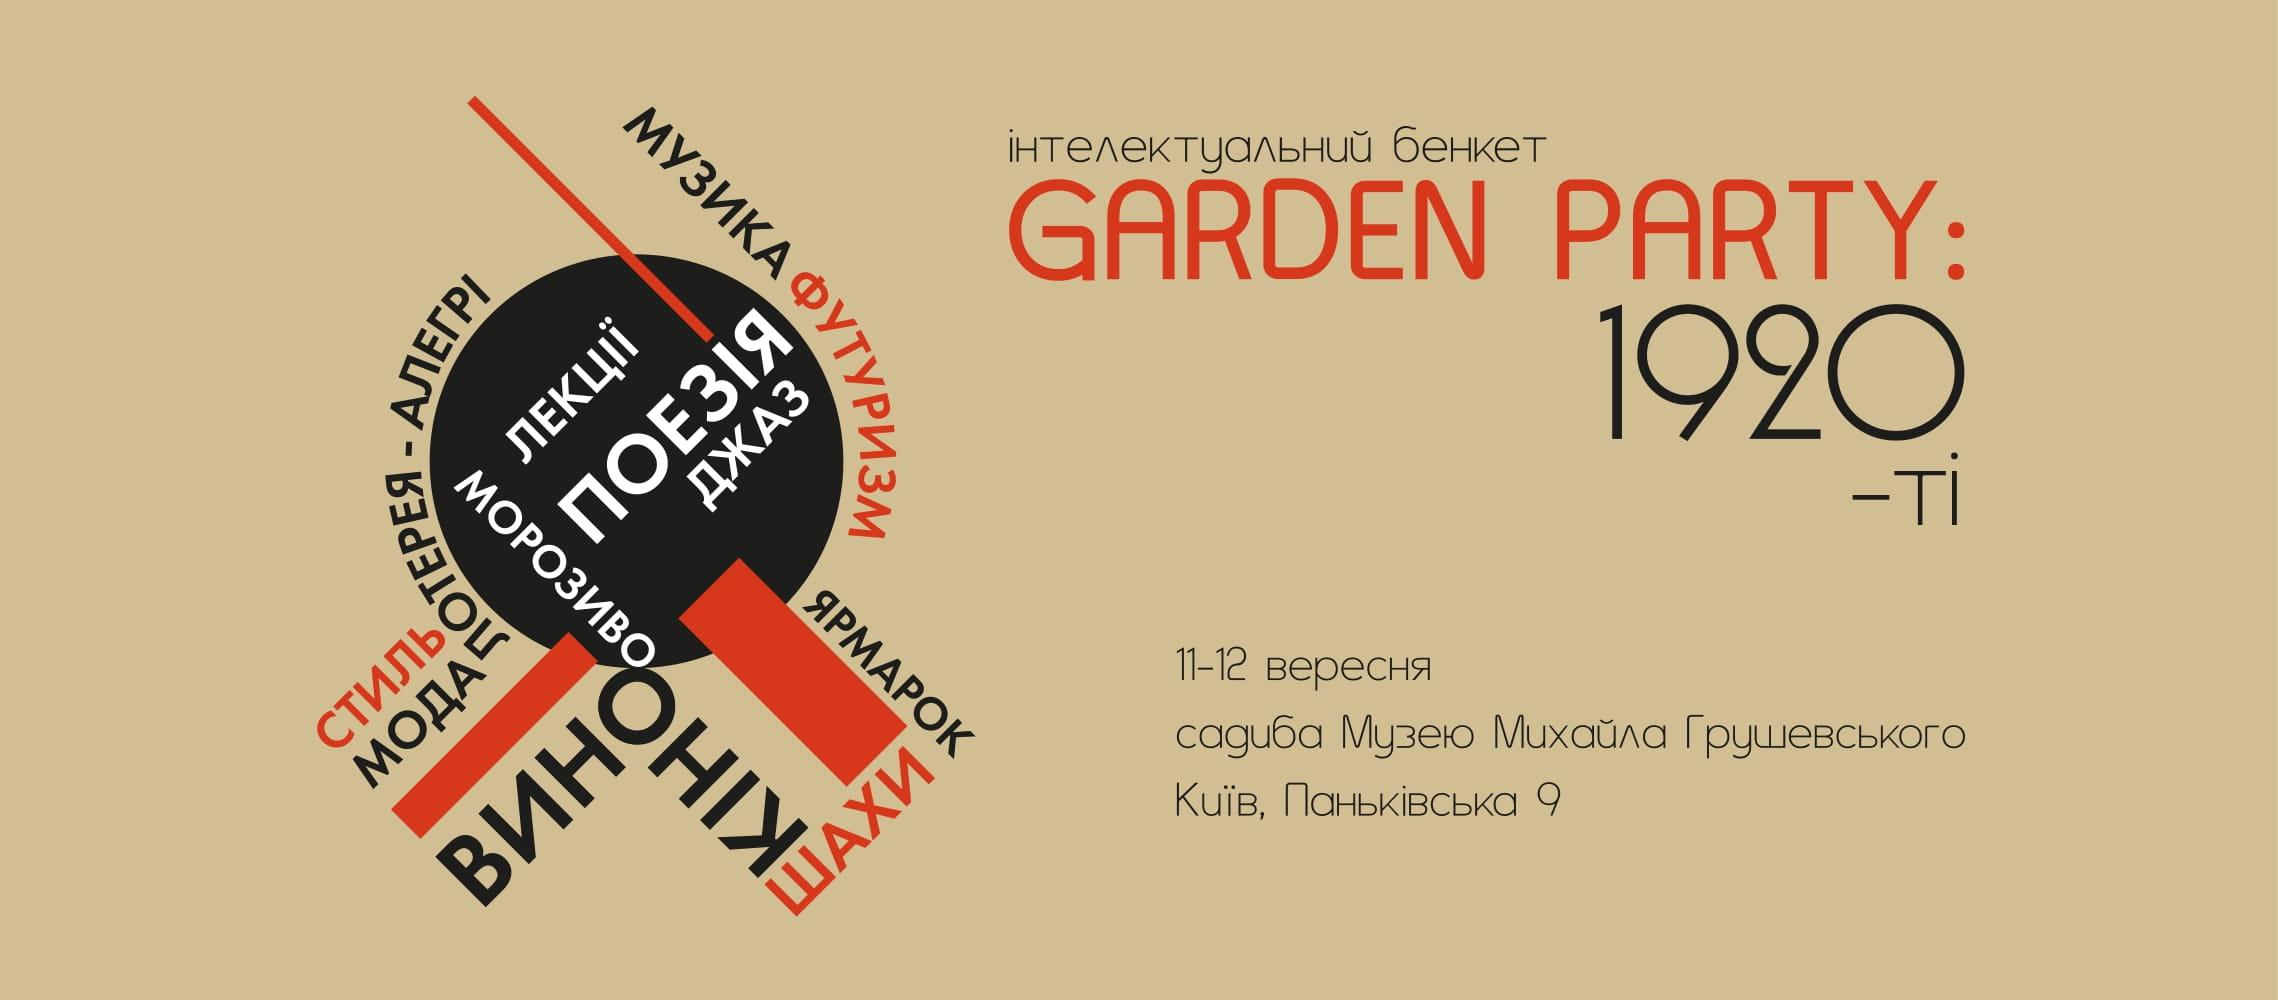 Garden Party: 1920-ті